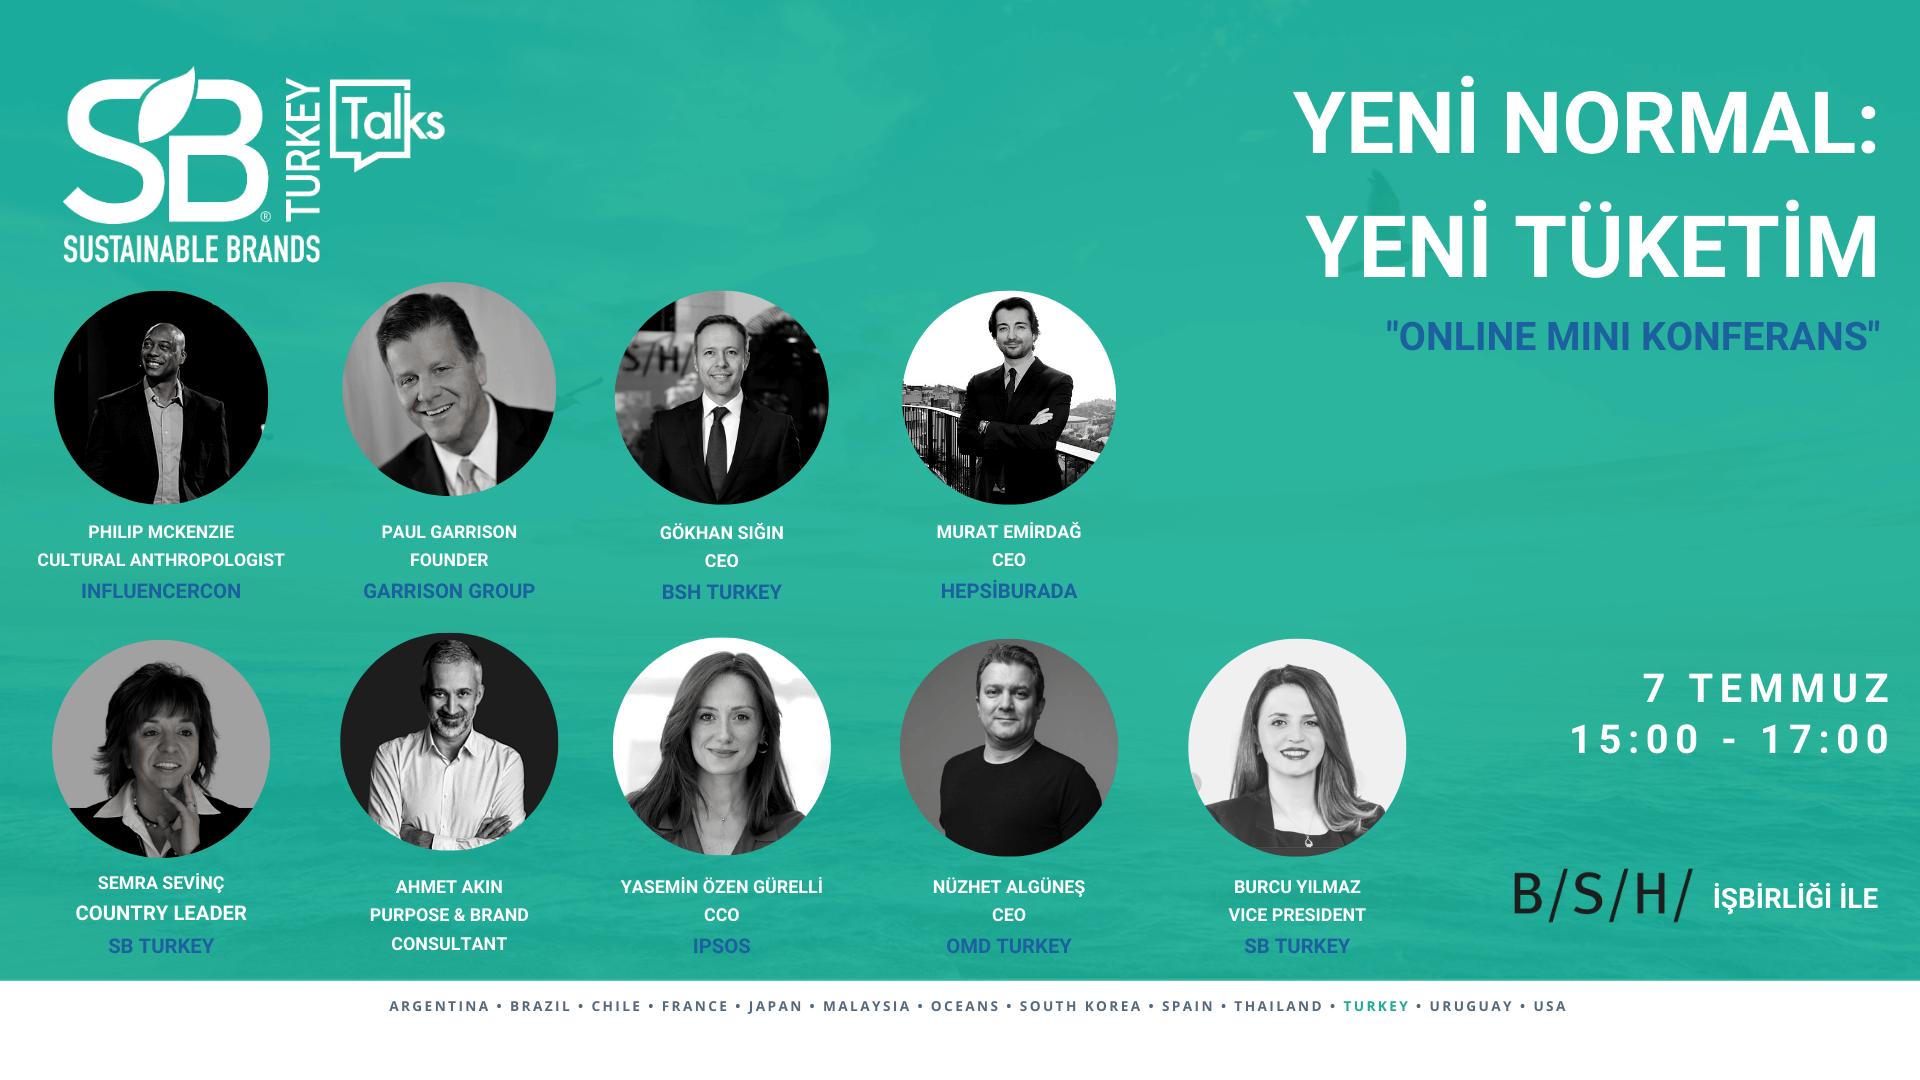 Sustainable Brands Turkey Talks: Yeni Normal: Yeni Tüketim